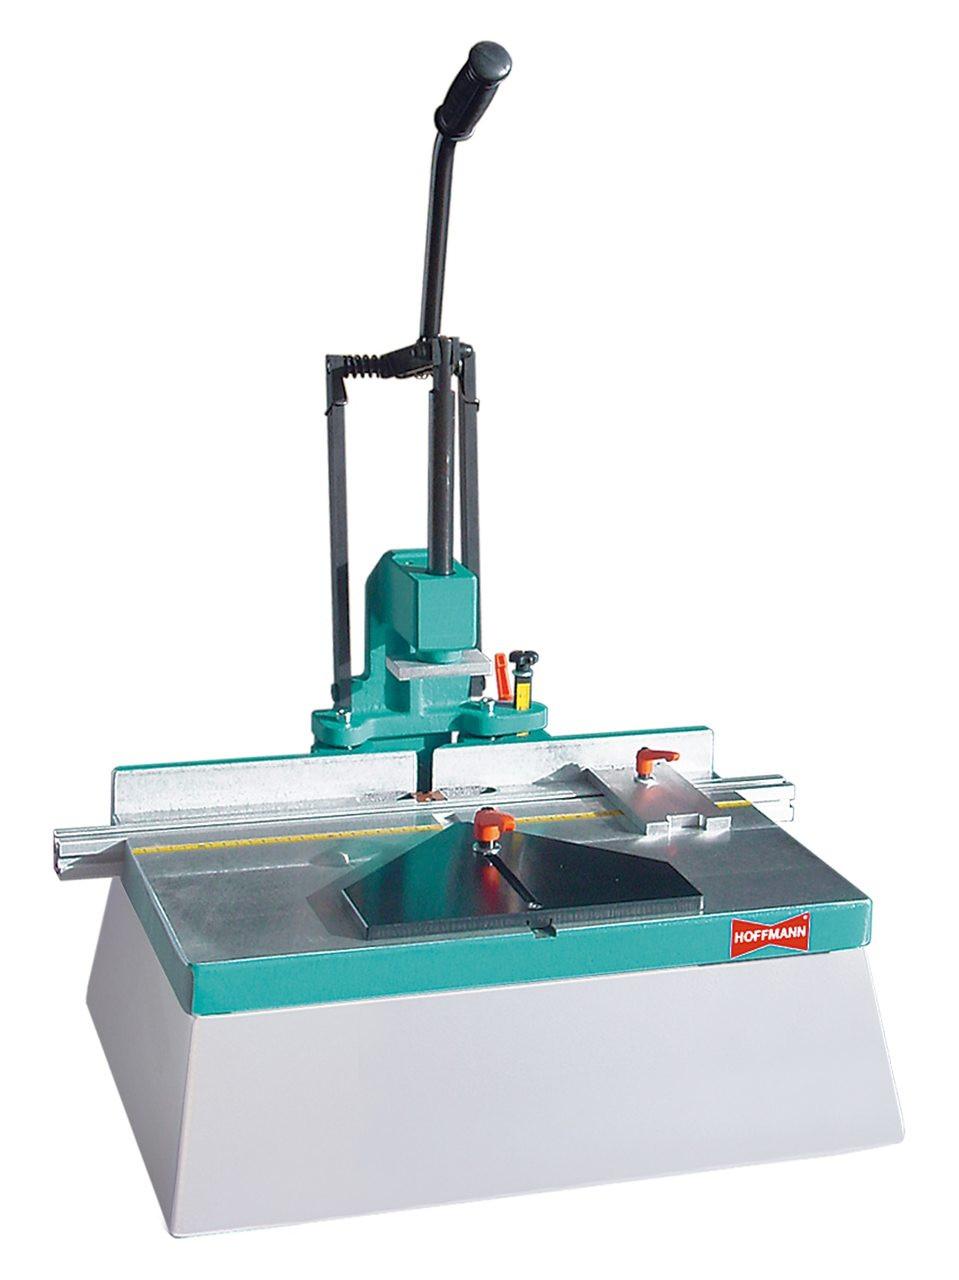 Hoffmann X20 Manual Dovetail Routing Machine